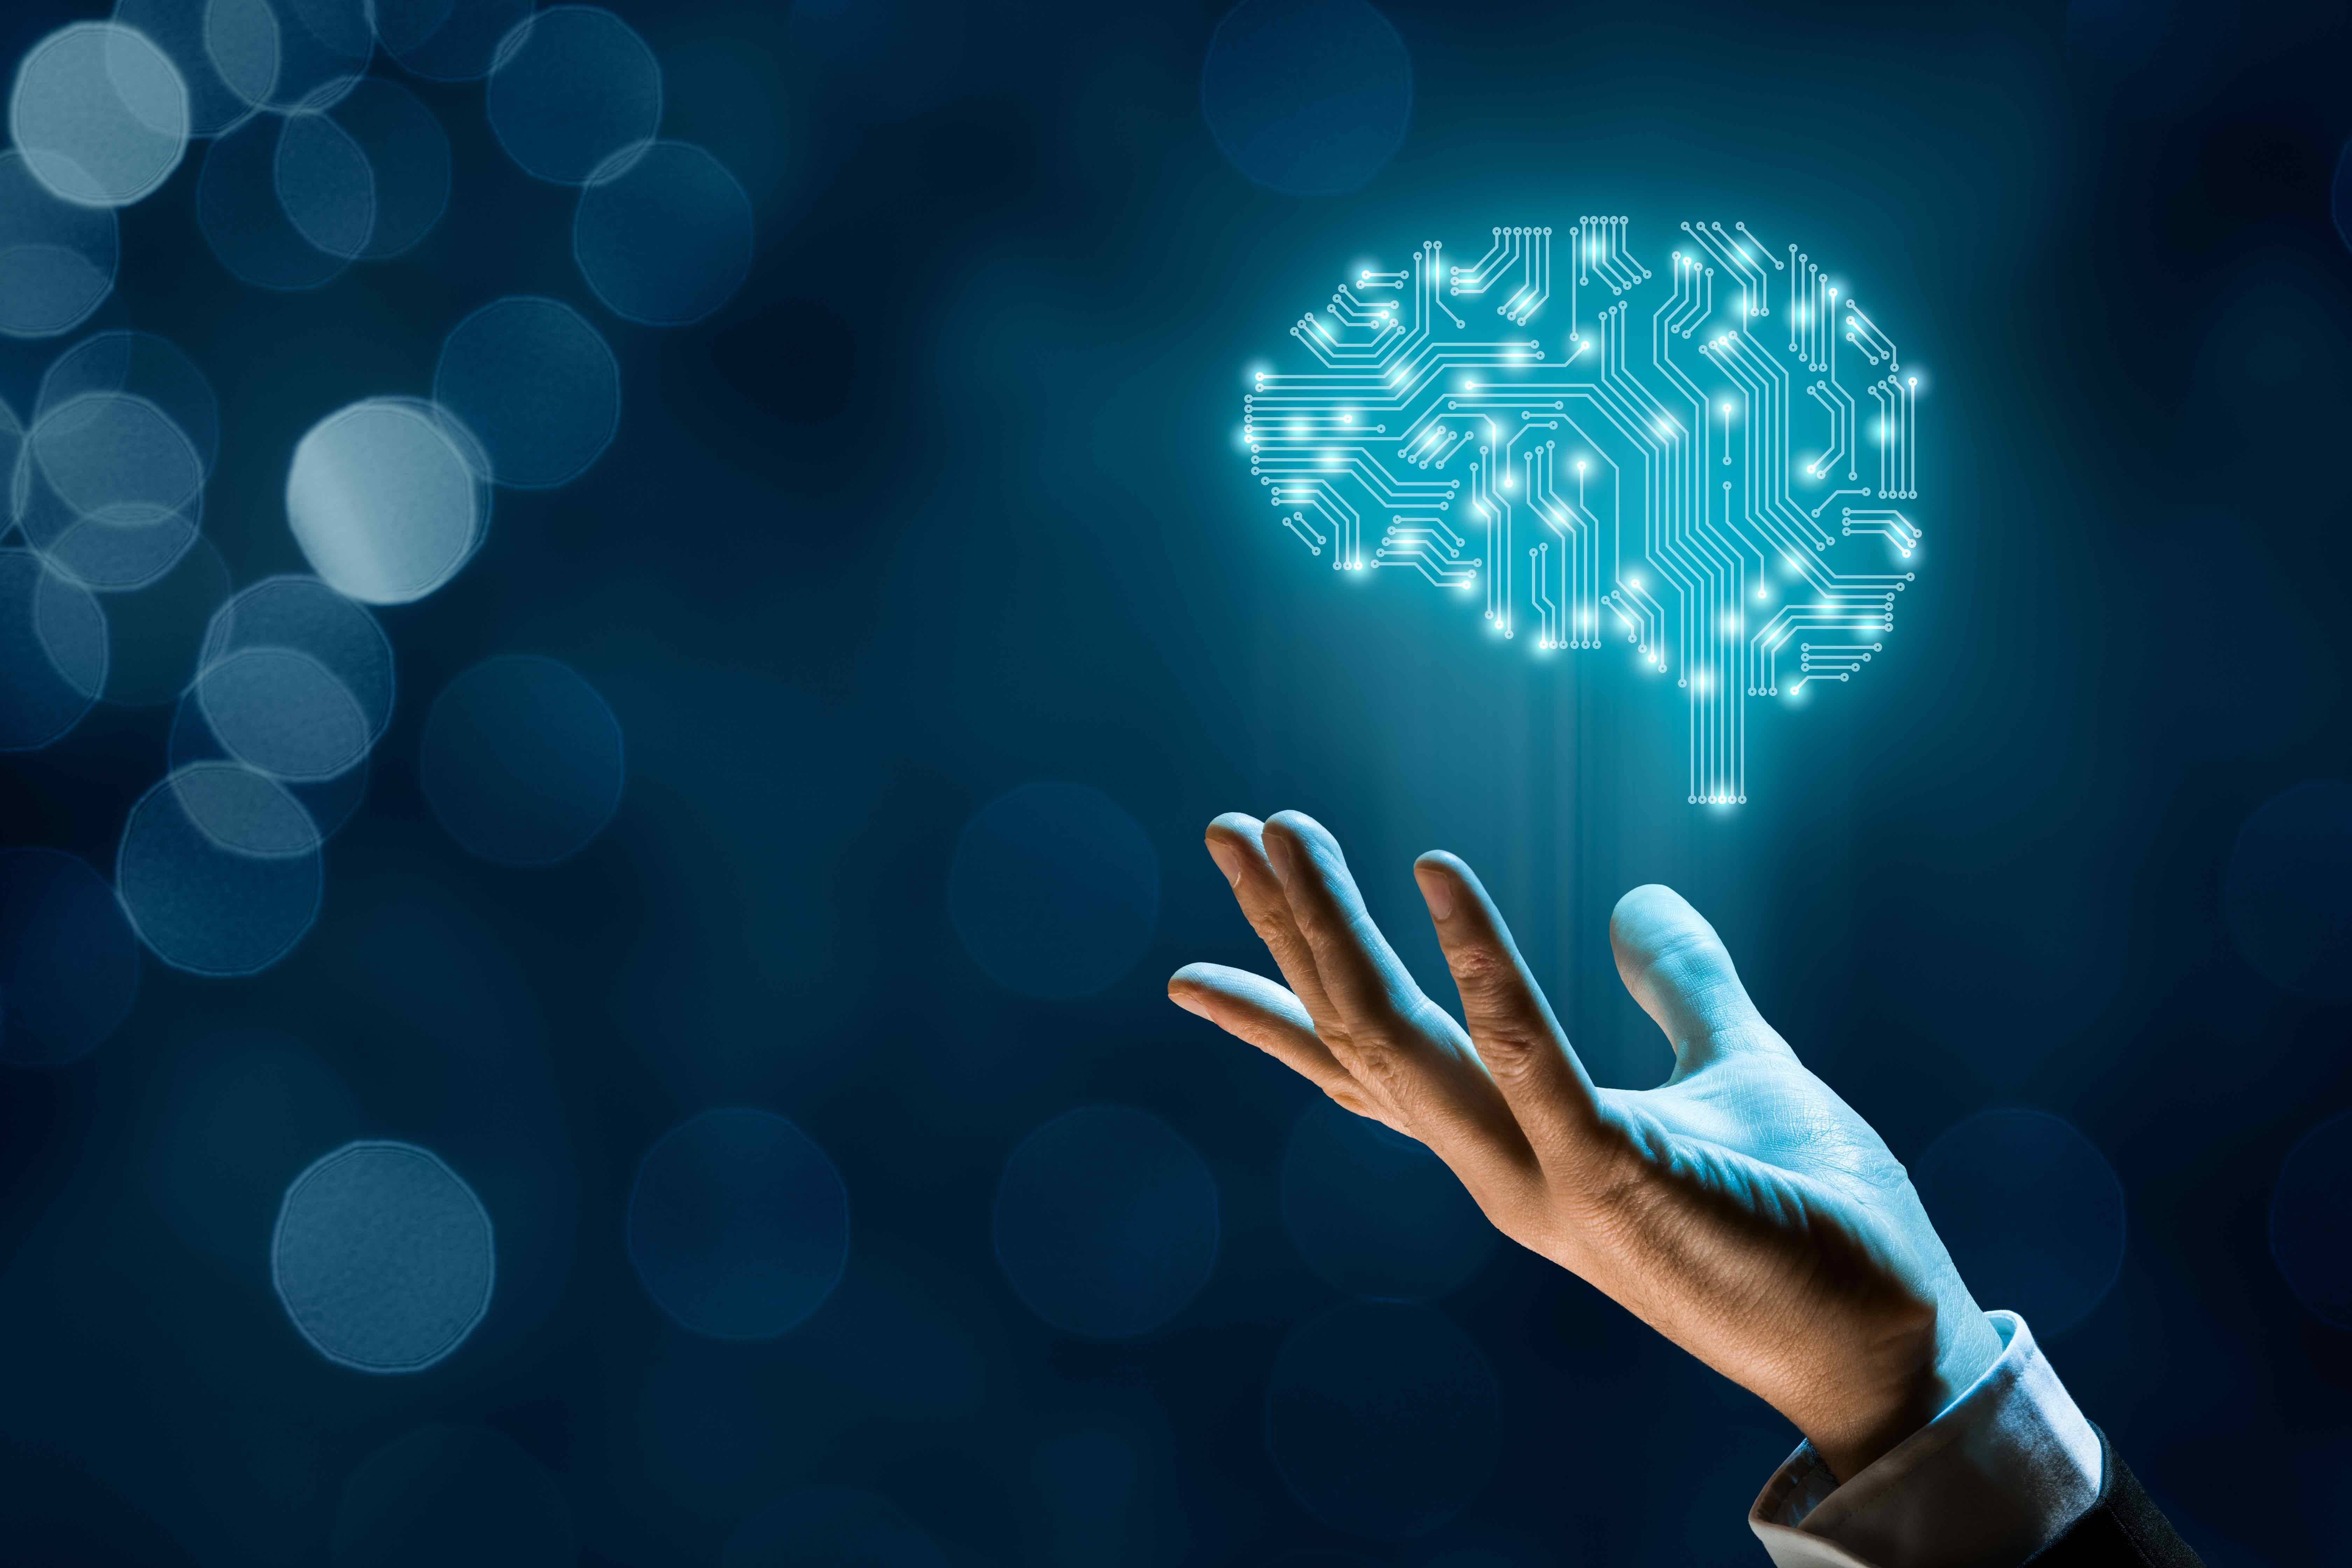 Hand holding Visualization of Electronic Brain